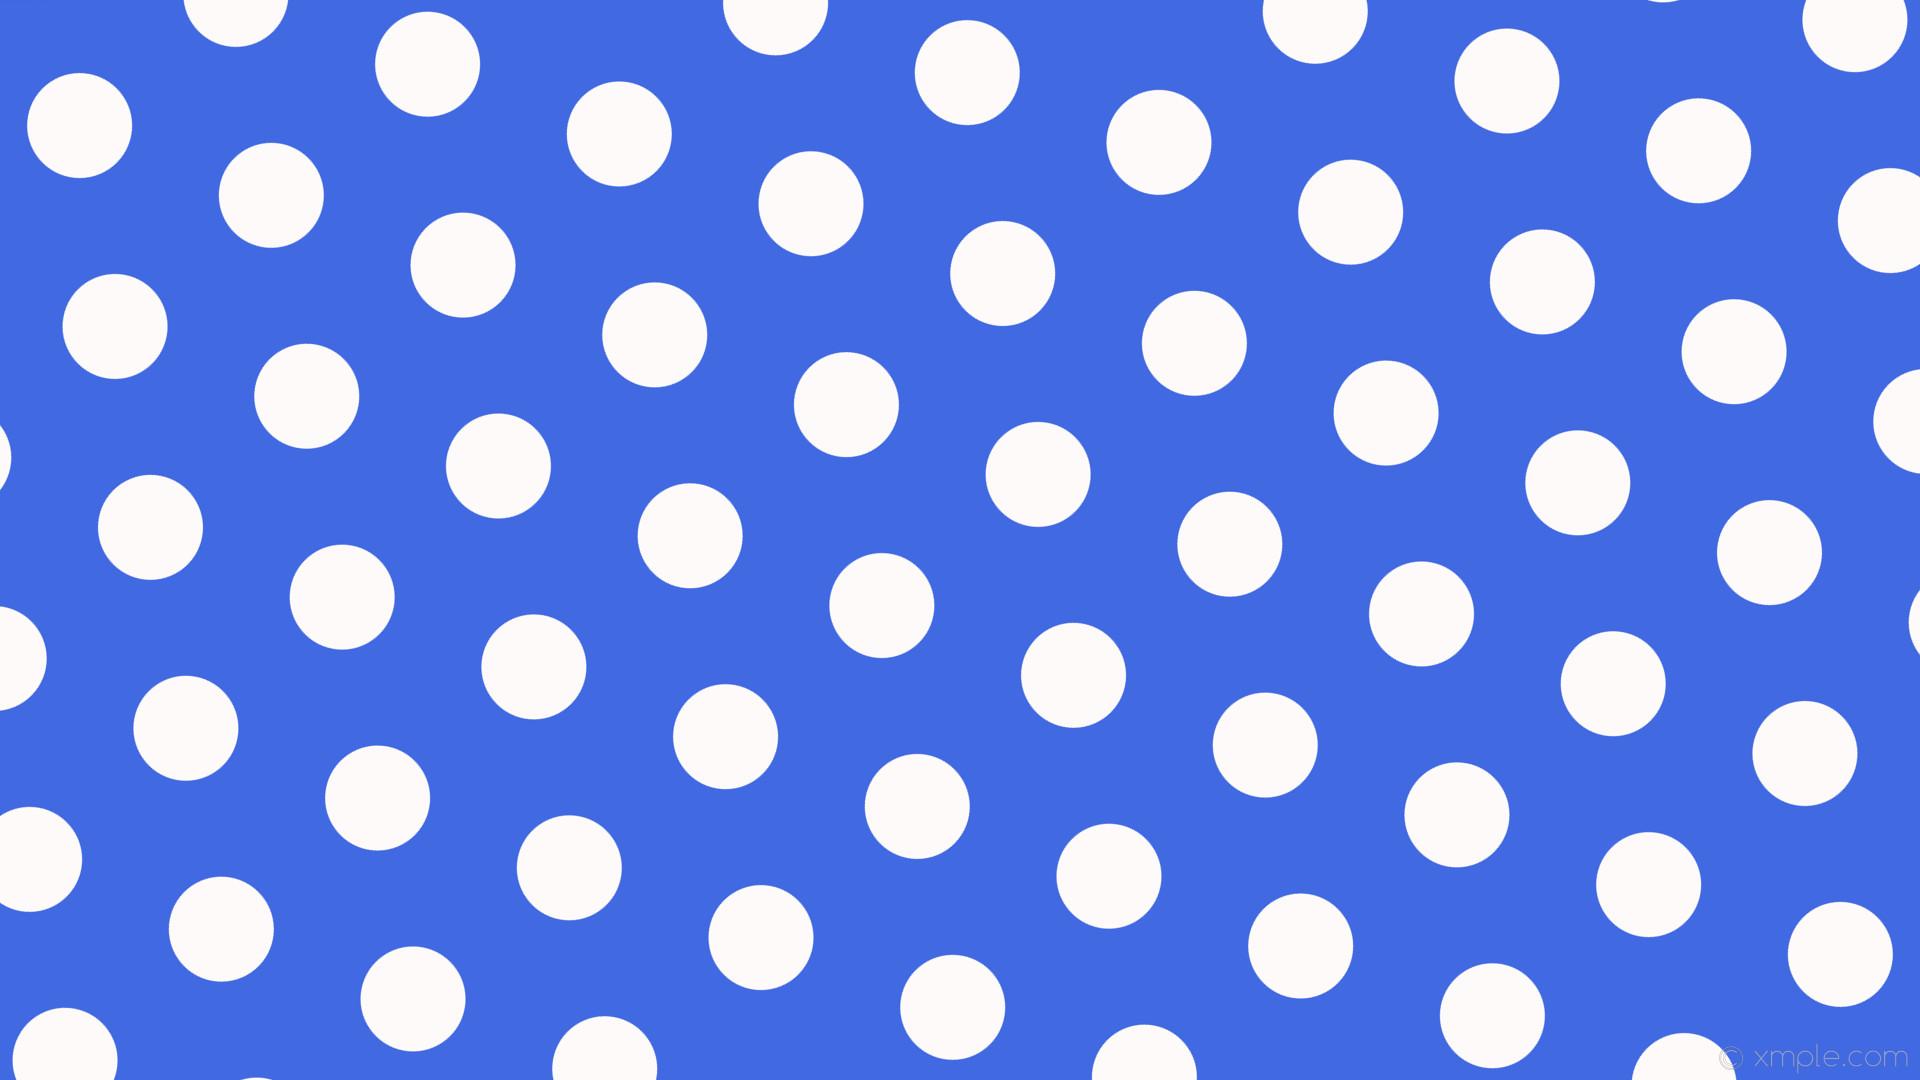 wallpaper blue polka dots hexagon white royal blue snow #4169e1 #fffafa  diagonal 40°